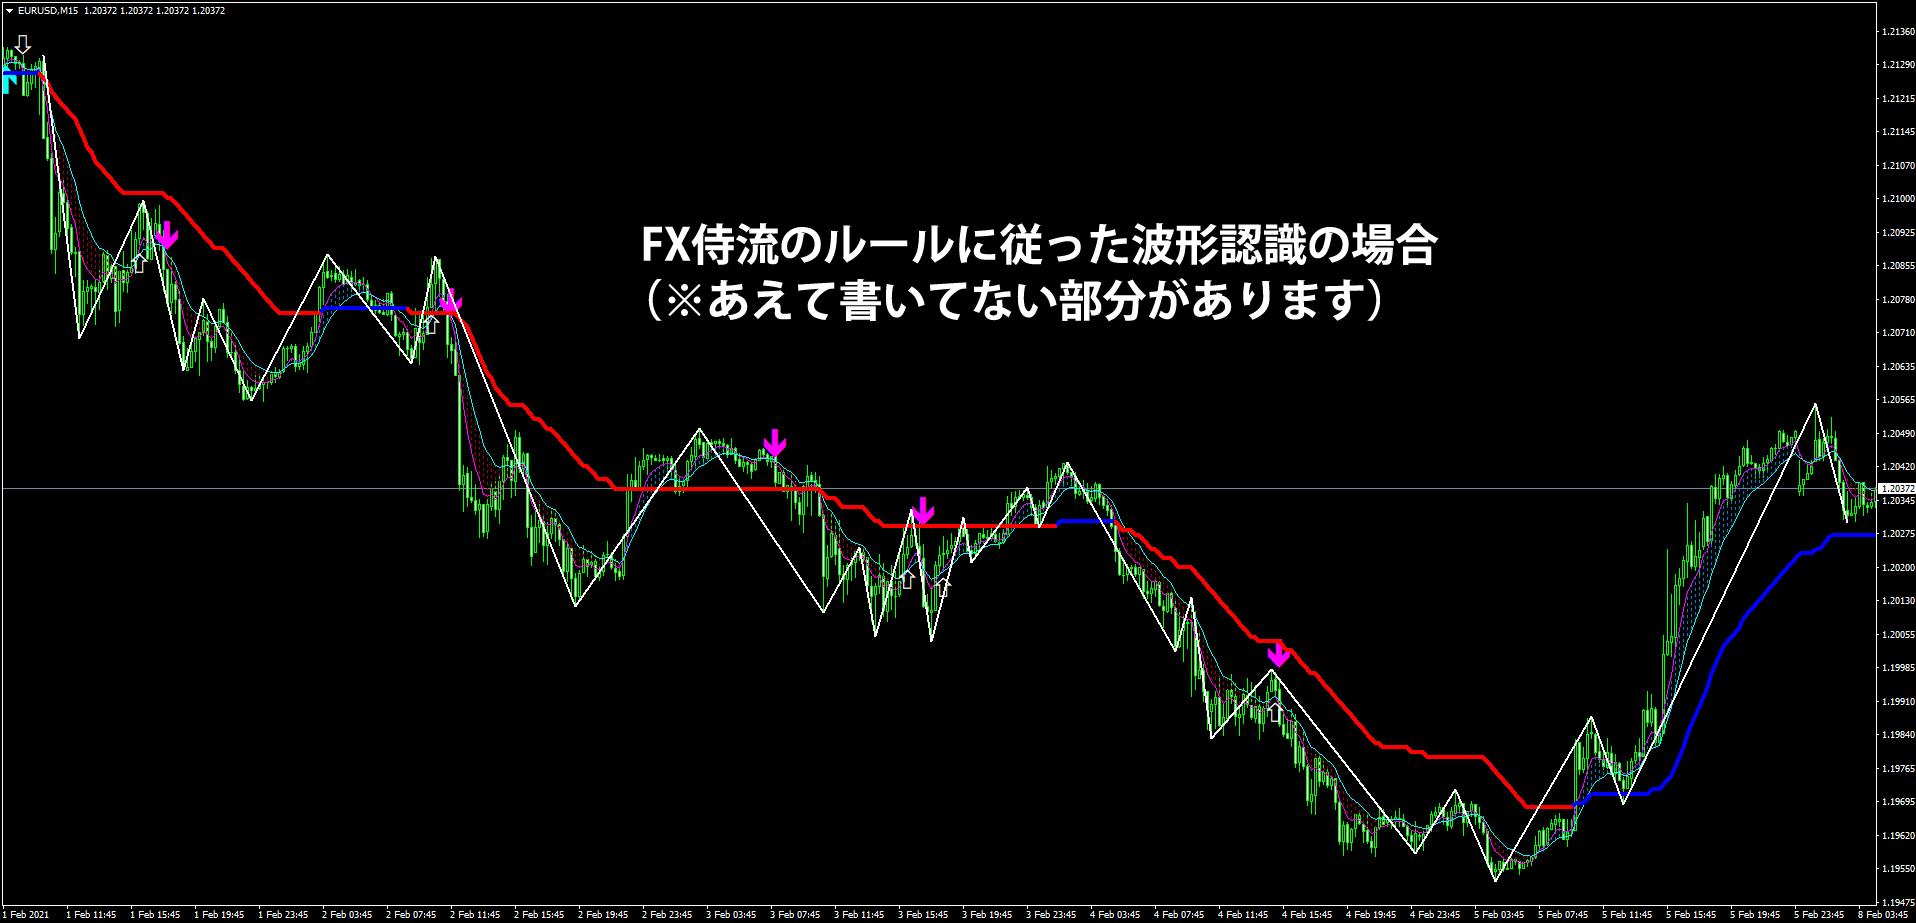 FX侍流のユーロドルでの波形認識